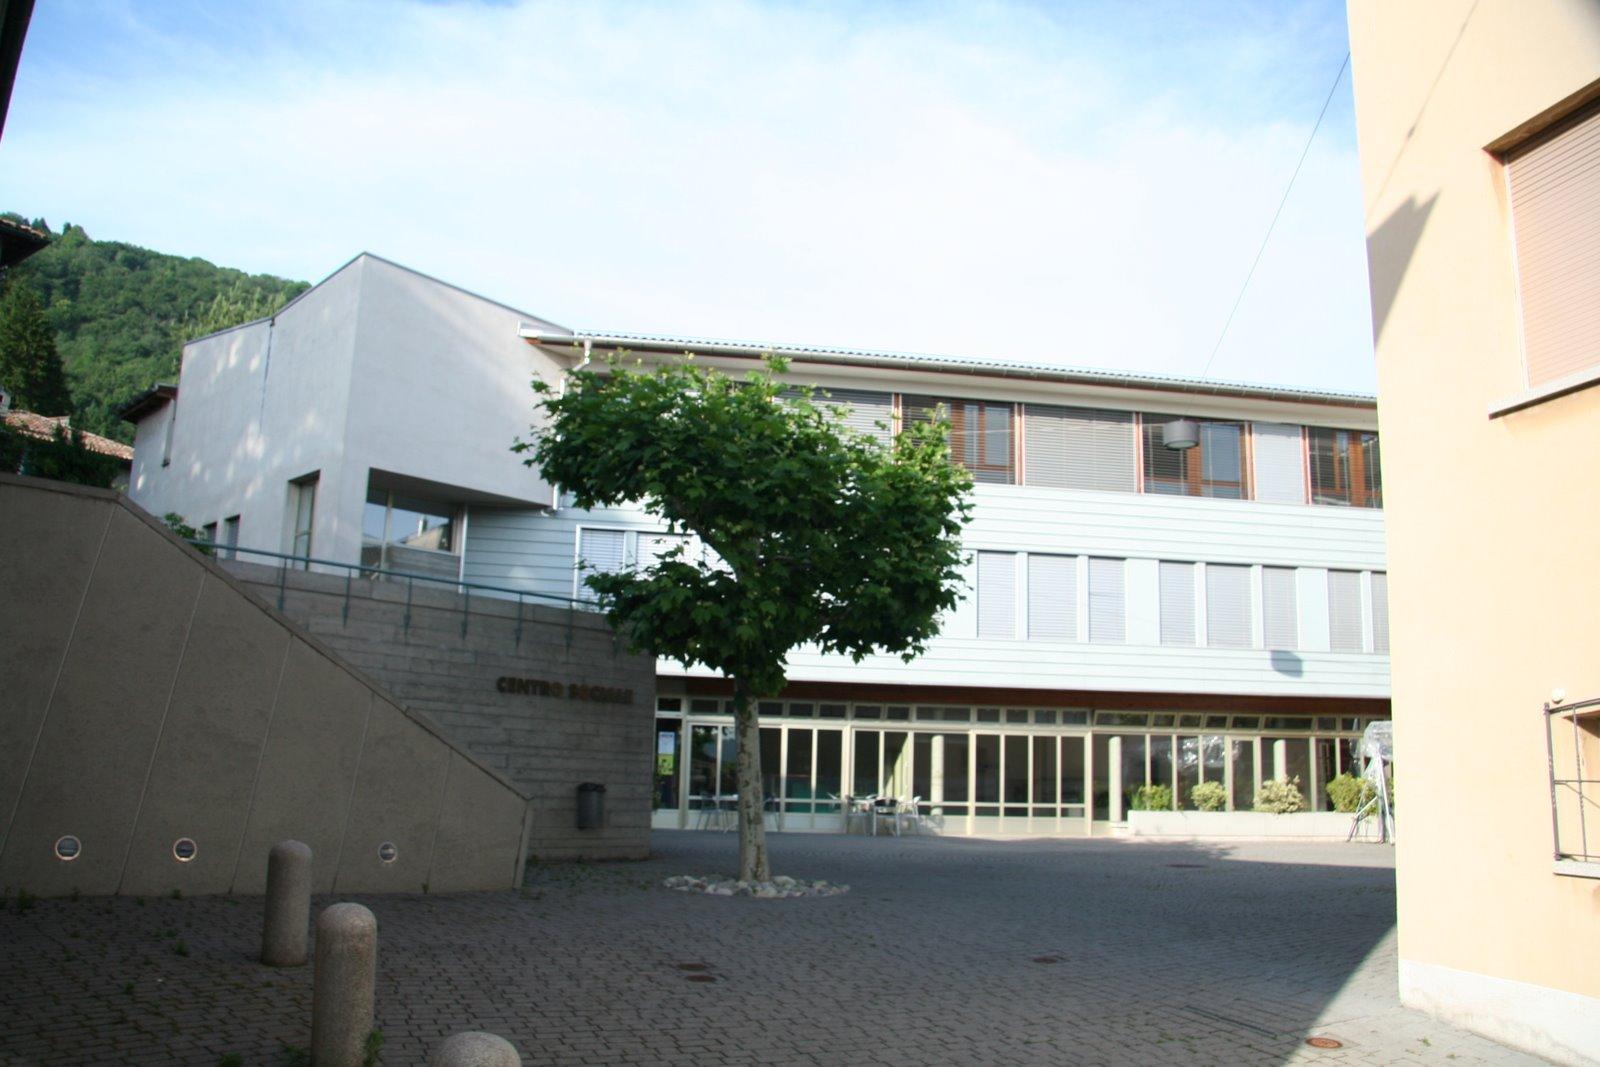 centro sociale vacallo.jpg